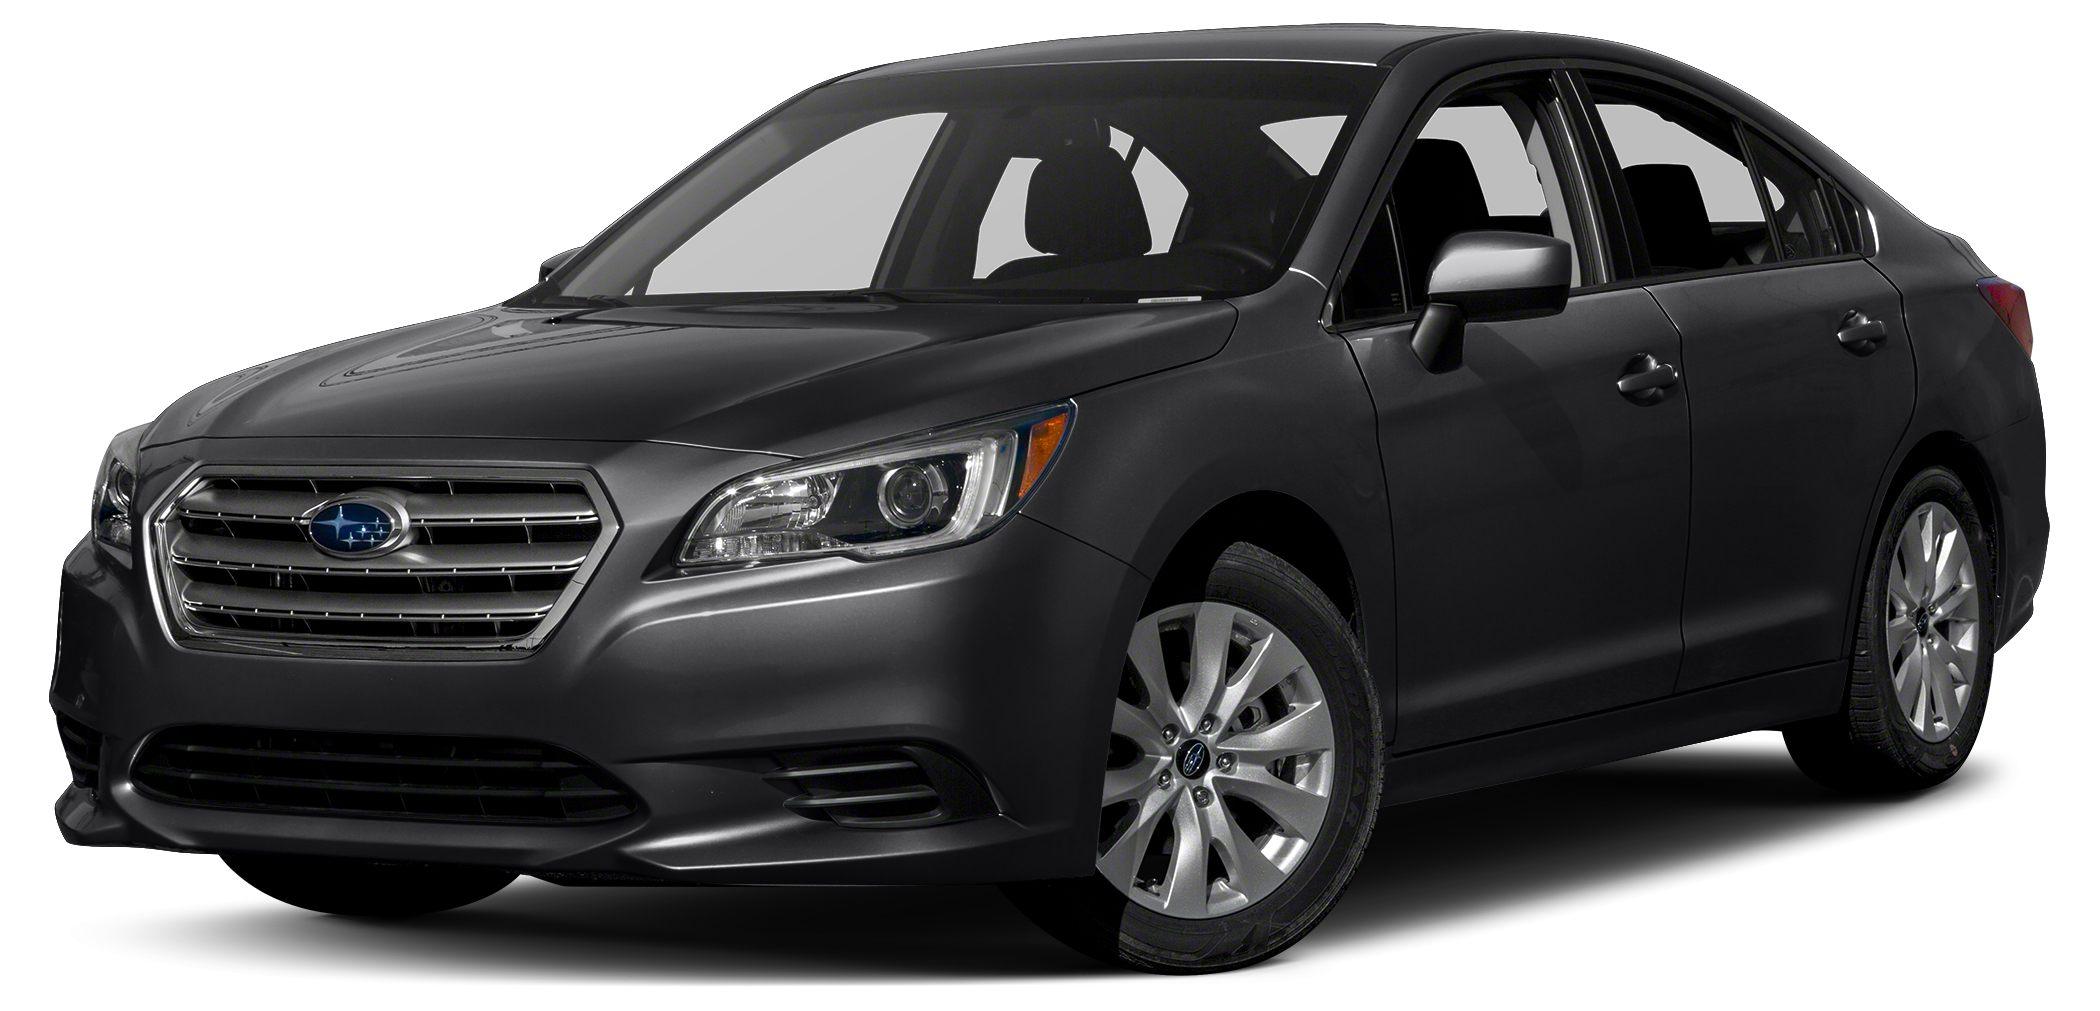 2015 Subaru Legacy 25i Premium Miles 35997Color Crystal Black Silica Stock 20369 VIN 4S3BNA